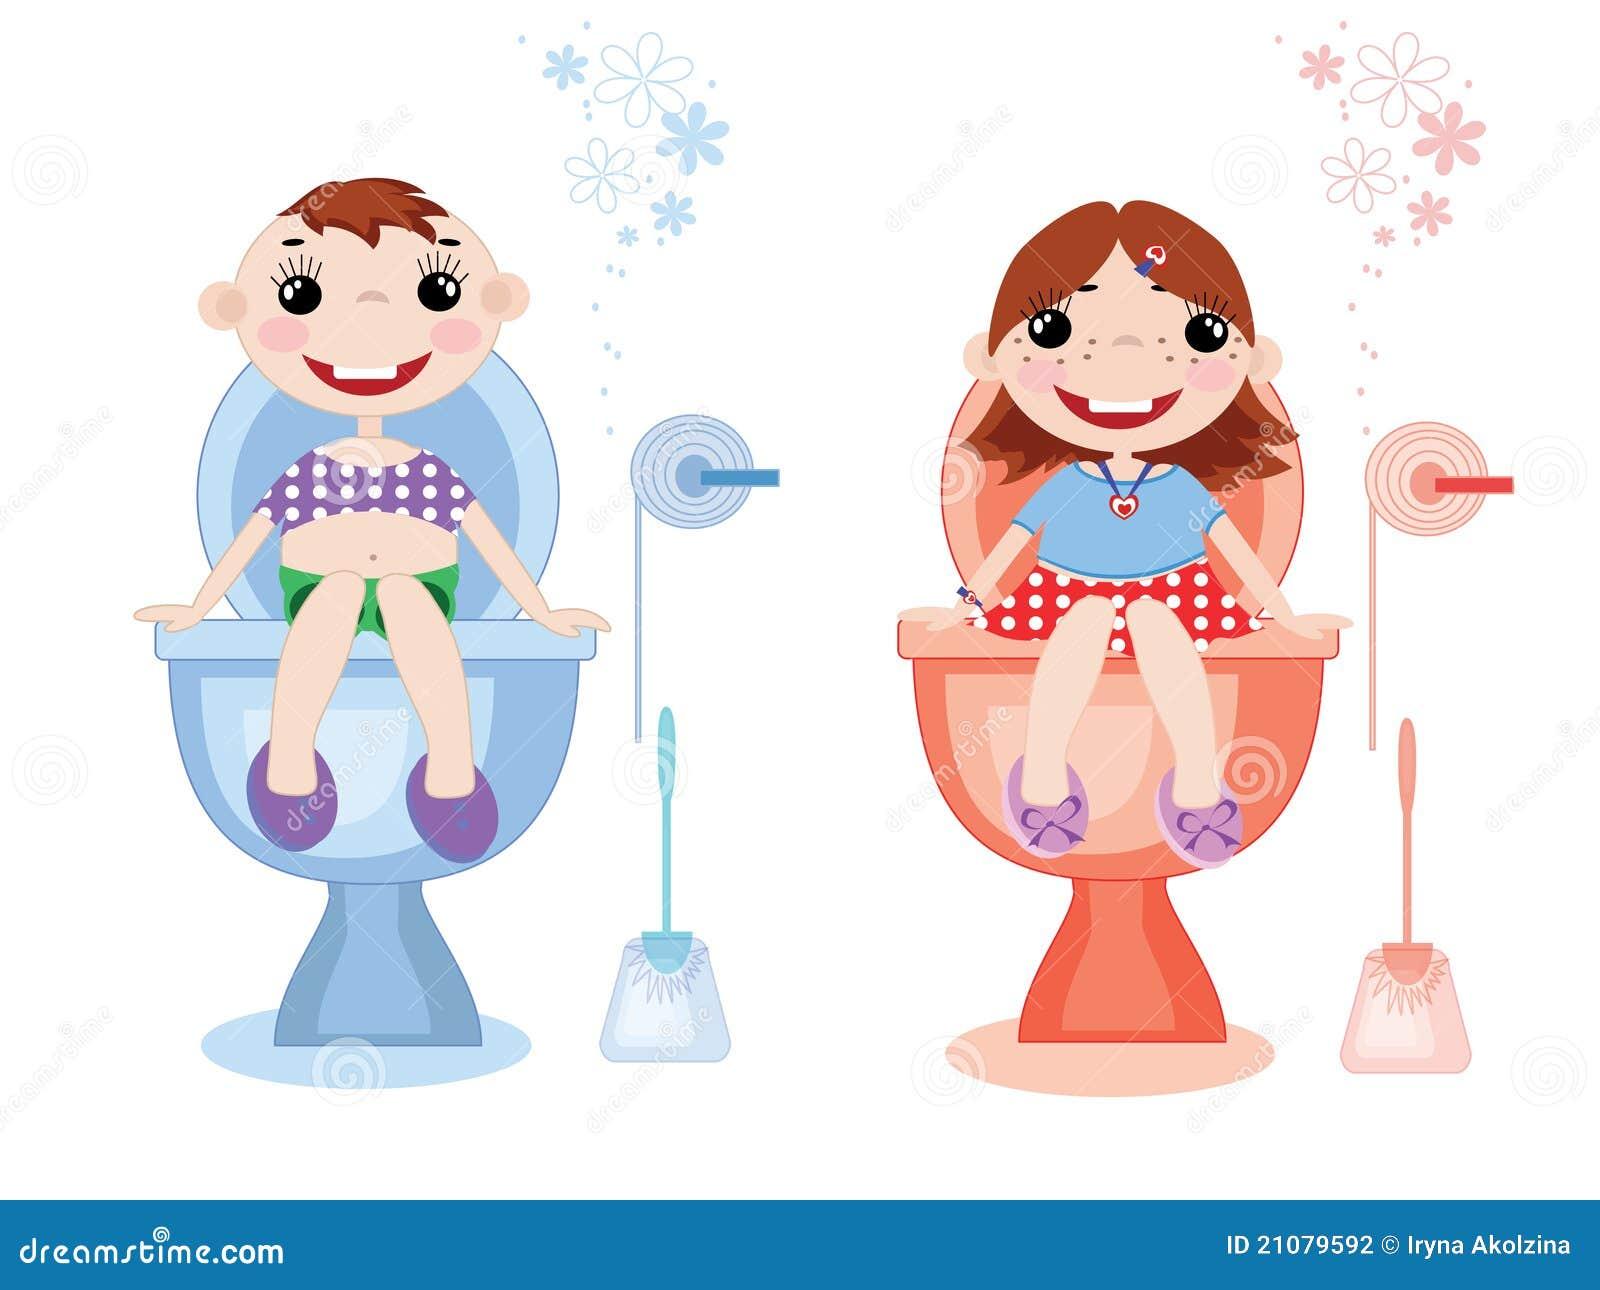 Рисунки на туалет в картинках